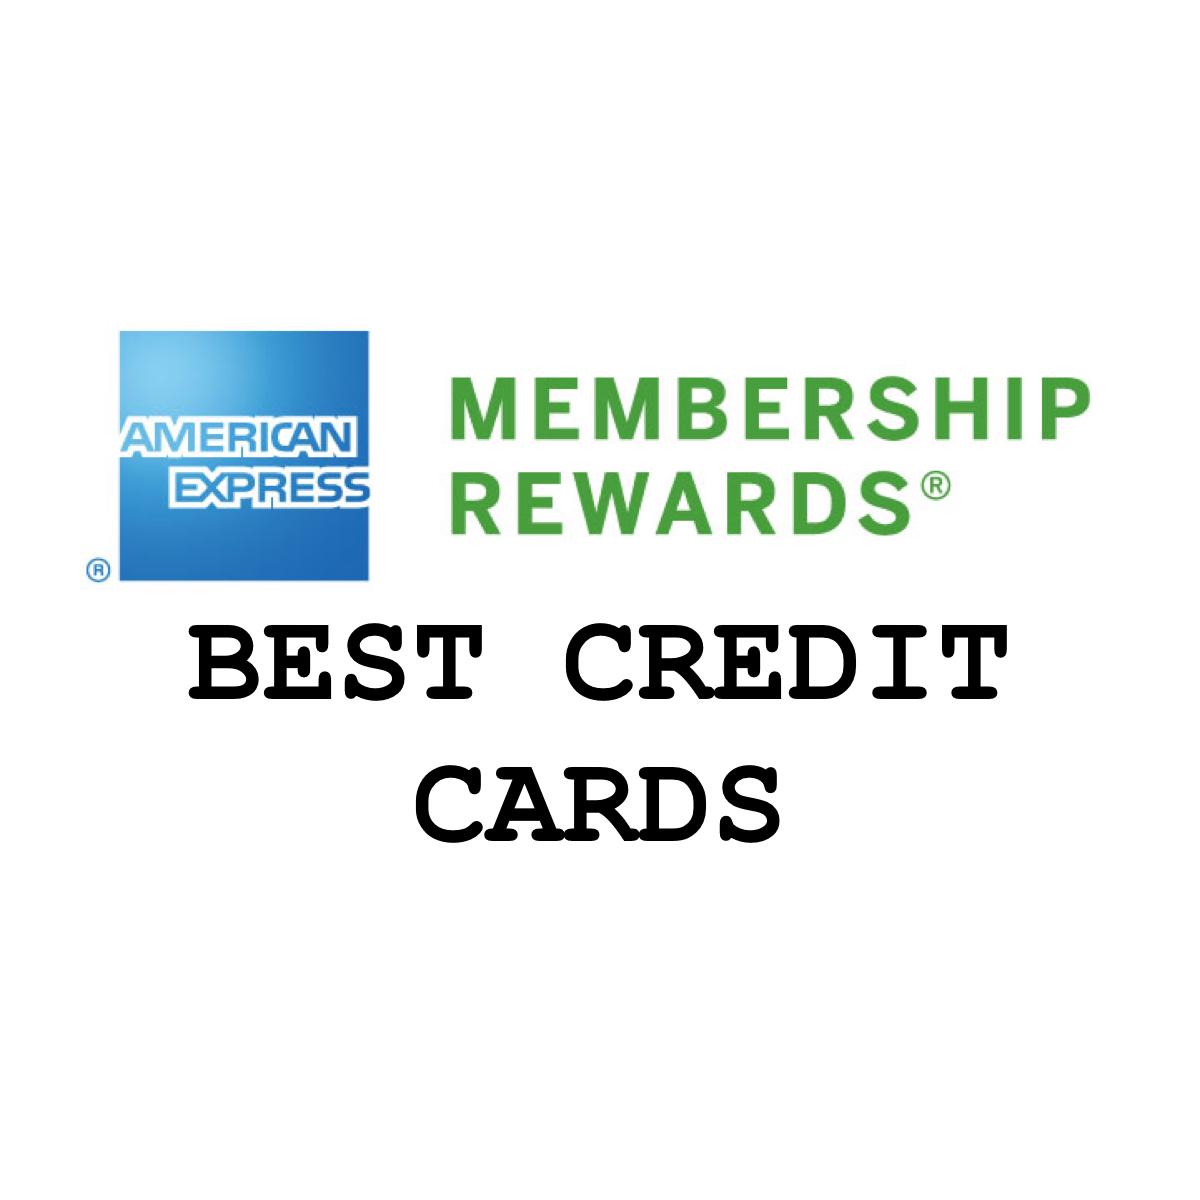 Best Credit Cards For Amex Membership Rewards Calculator Best Credit Cards Good Credit Membership Rewards